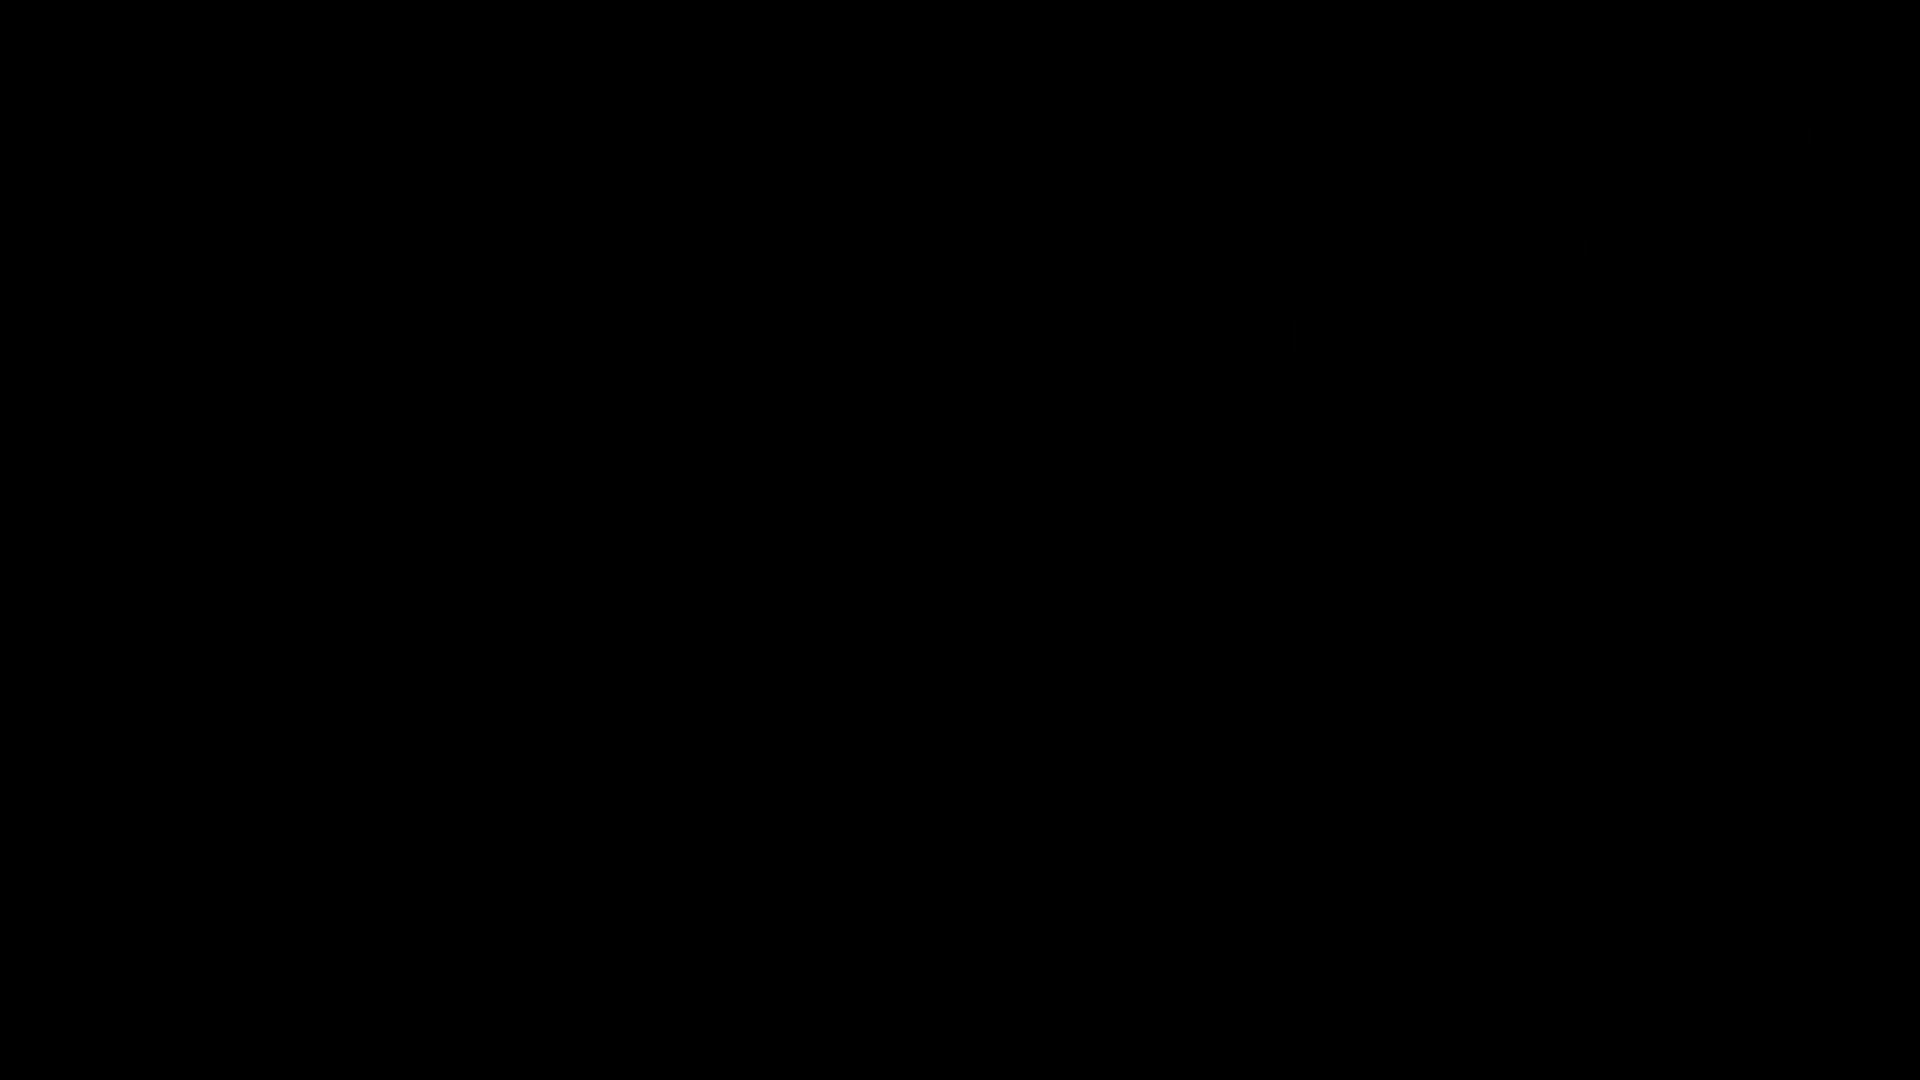 action, animation, apex legends, battle royal, comedy, crossover, d.va, fight, fortnite, mei, mercy, overwatch, sfm, source film maker, source filmmaker, steam, team fortress 2, tf2, valve, verses, potg GIFs